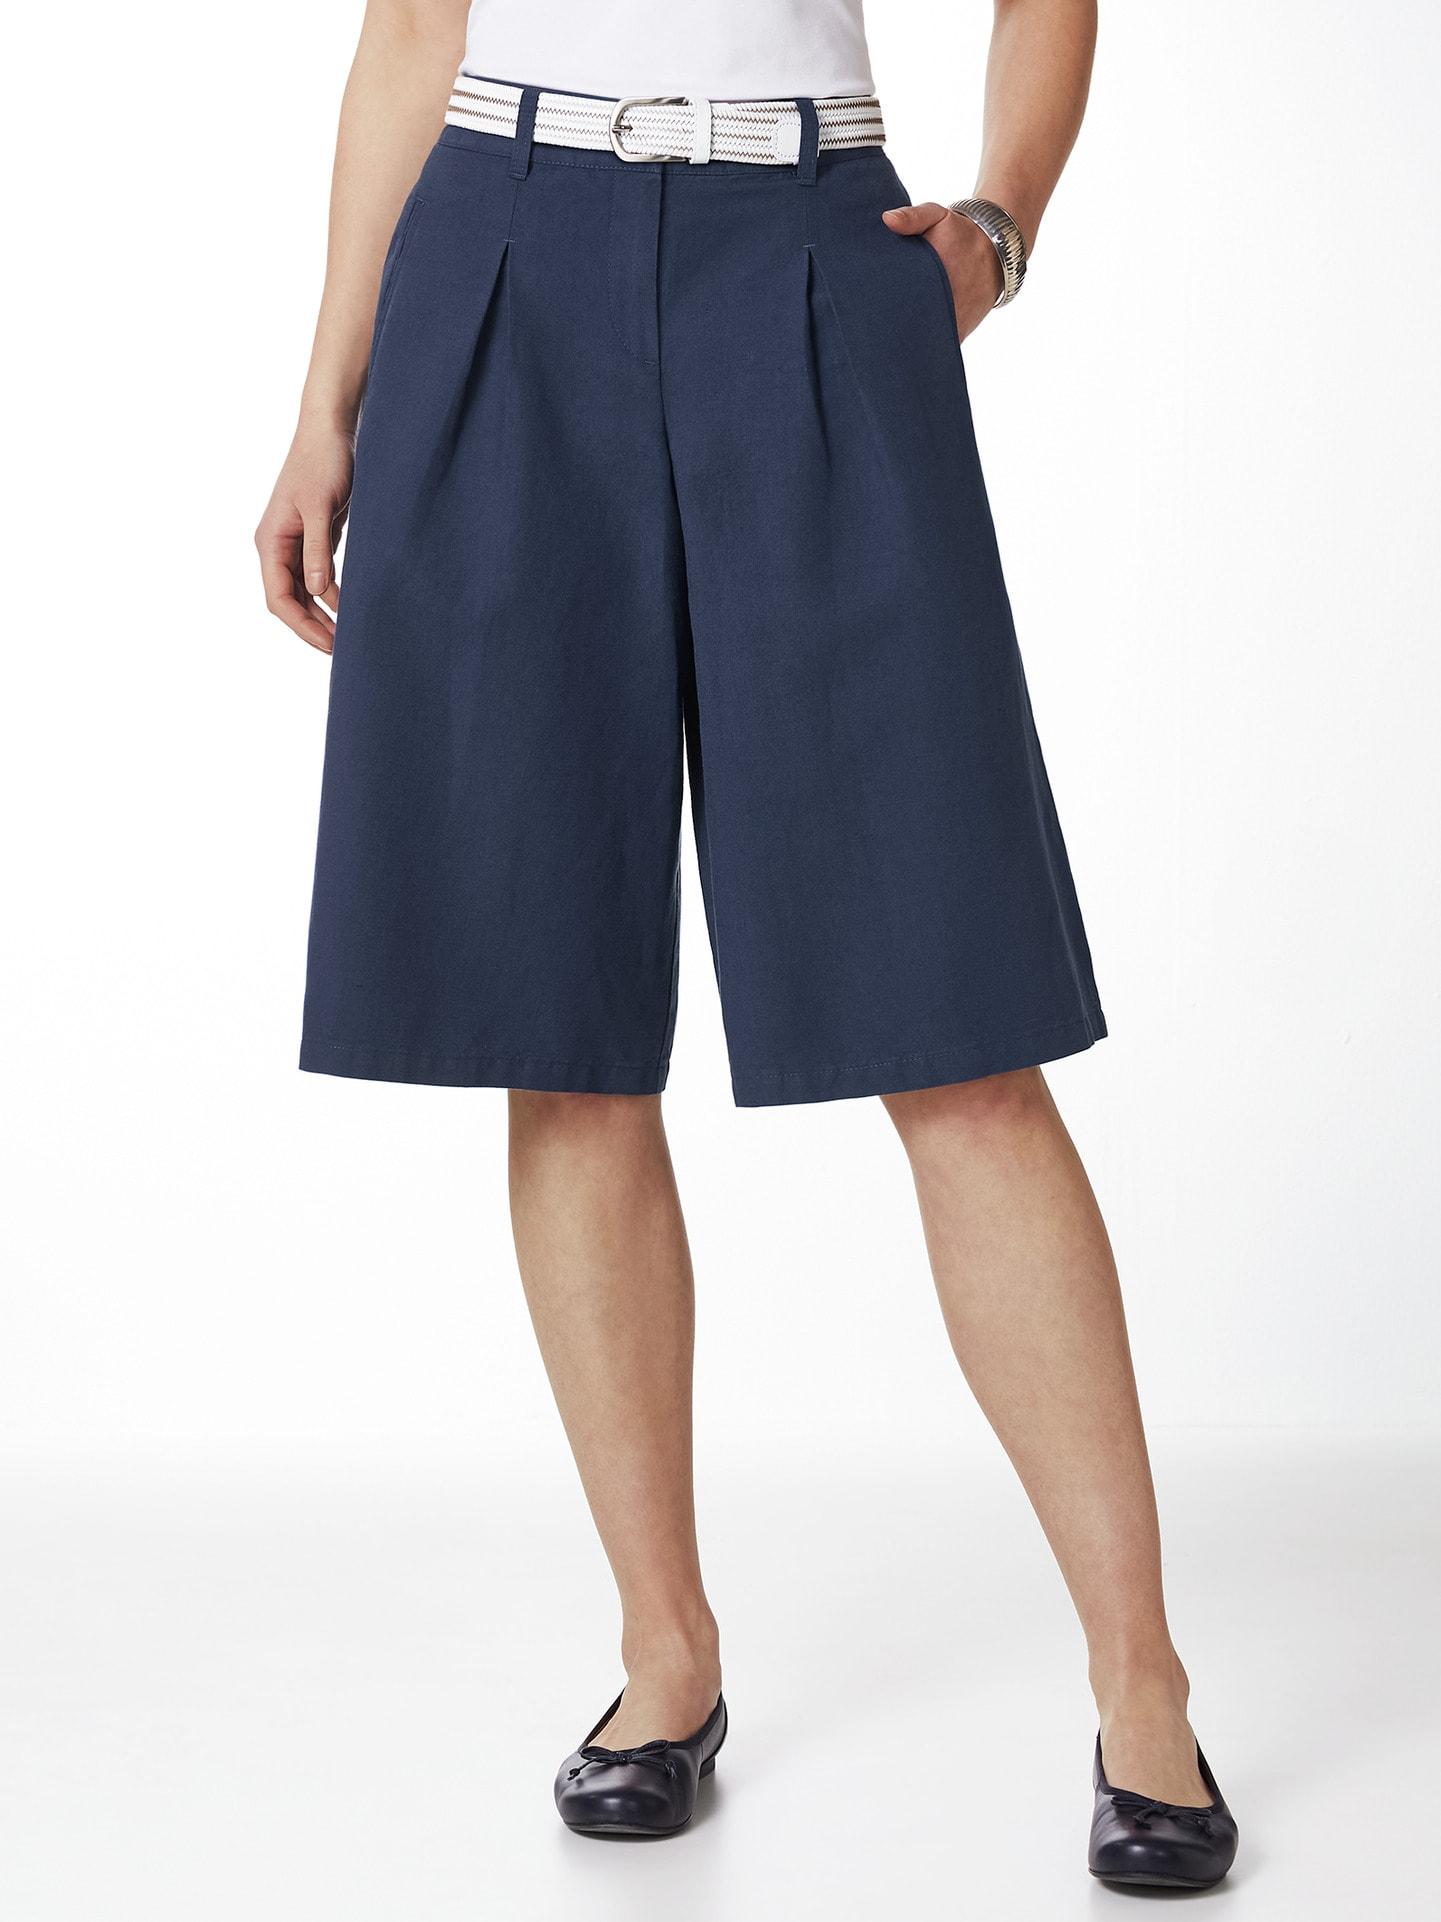 Walbusch Damen Leinen Hosenrock Größe 18